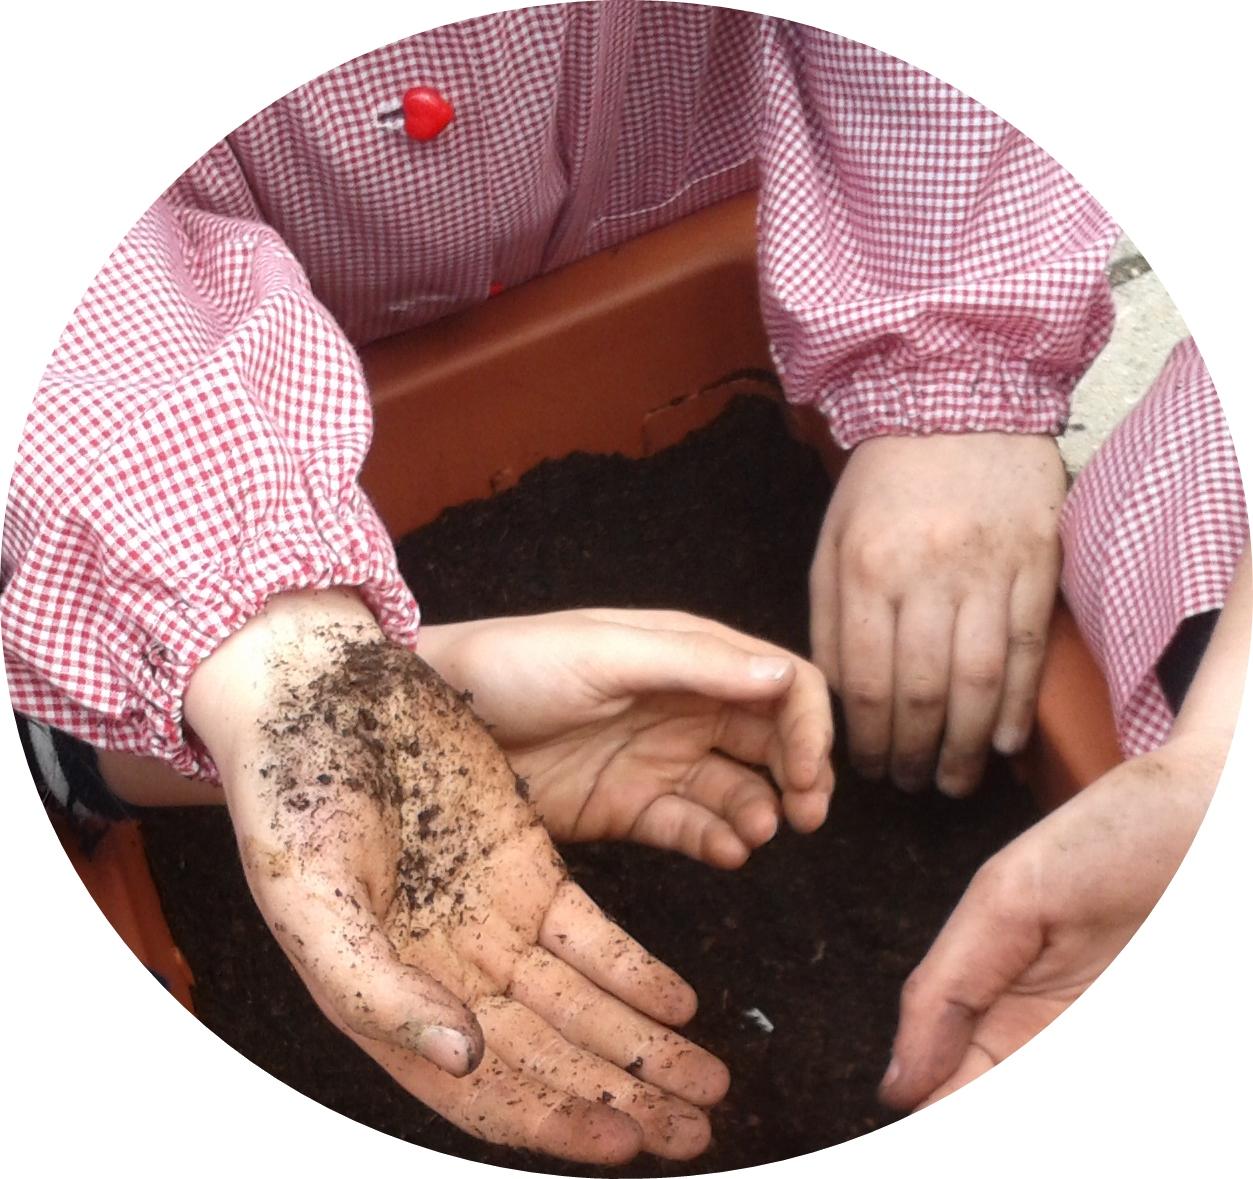 servizi tecnici, hort, analisi fragola, analisi pianta,